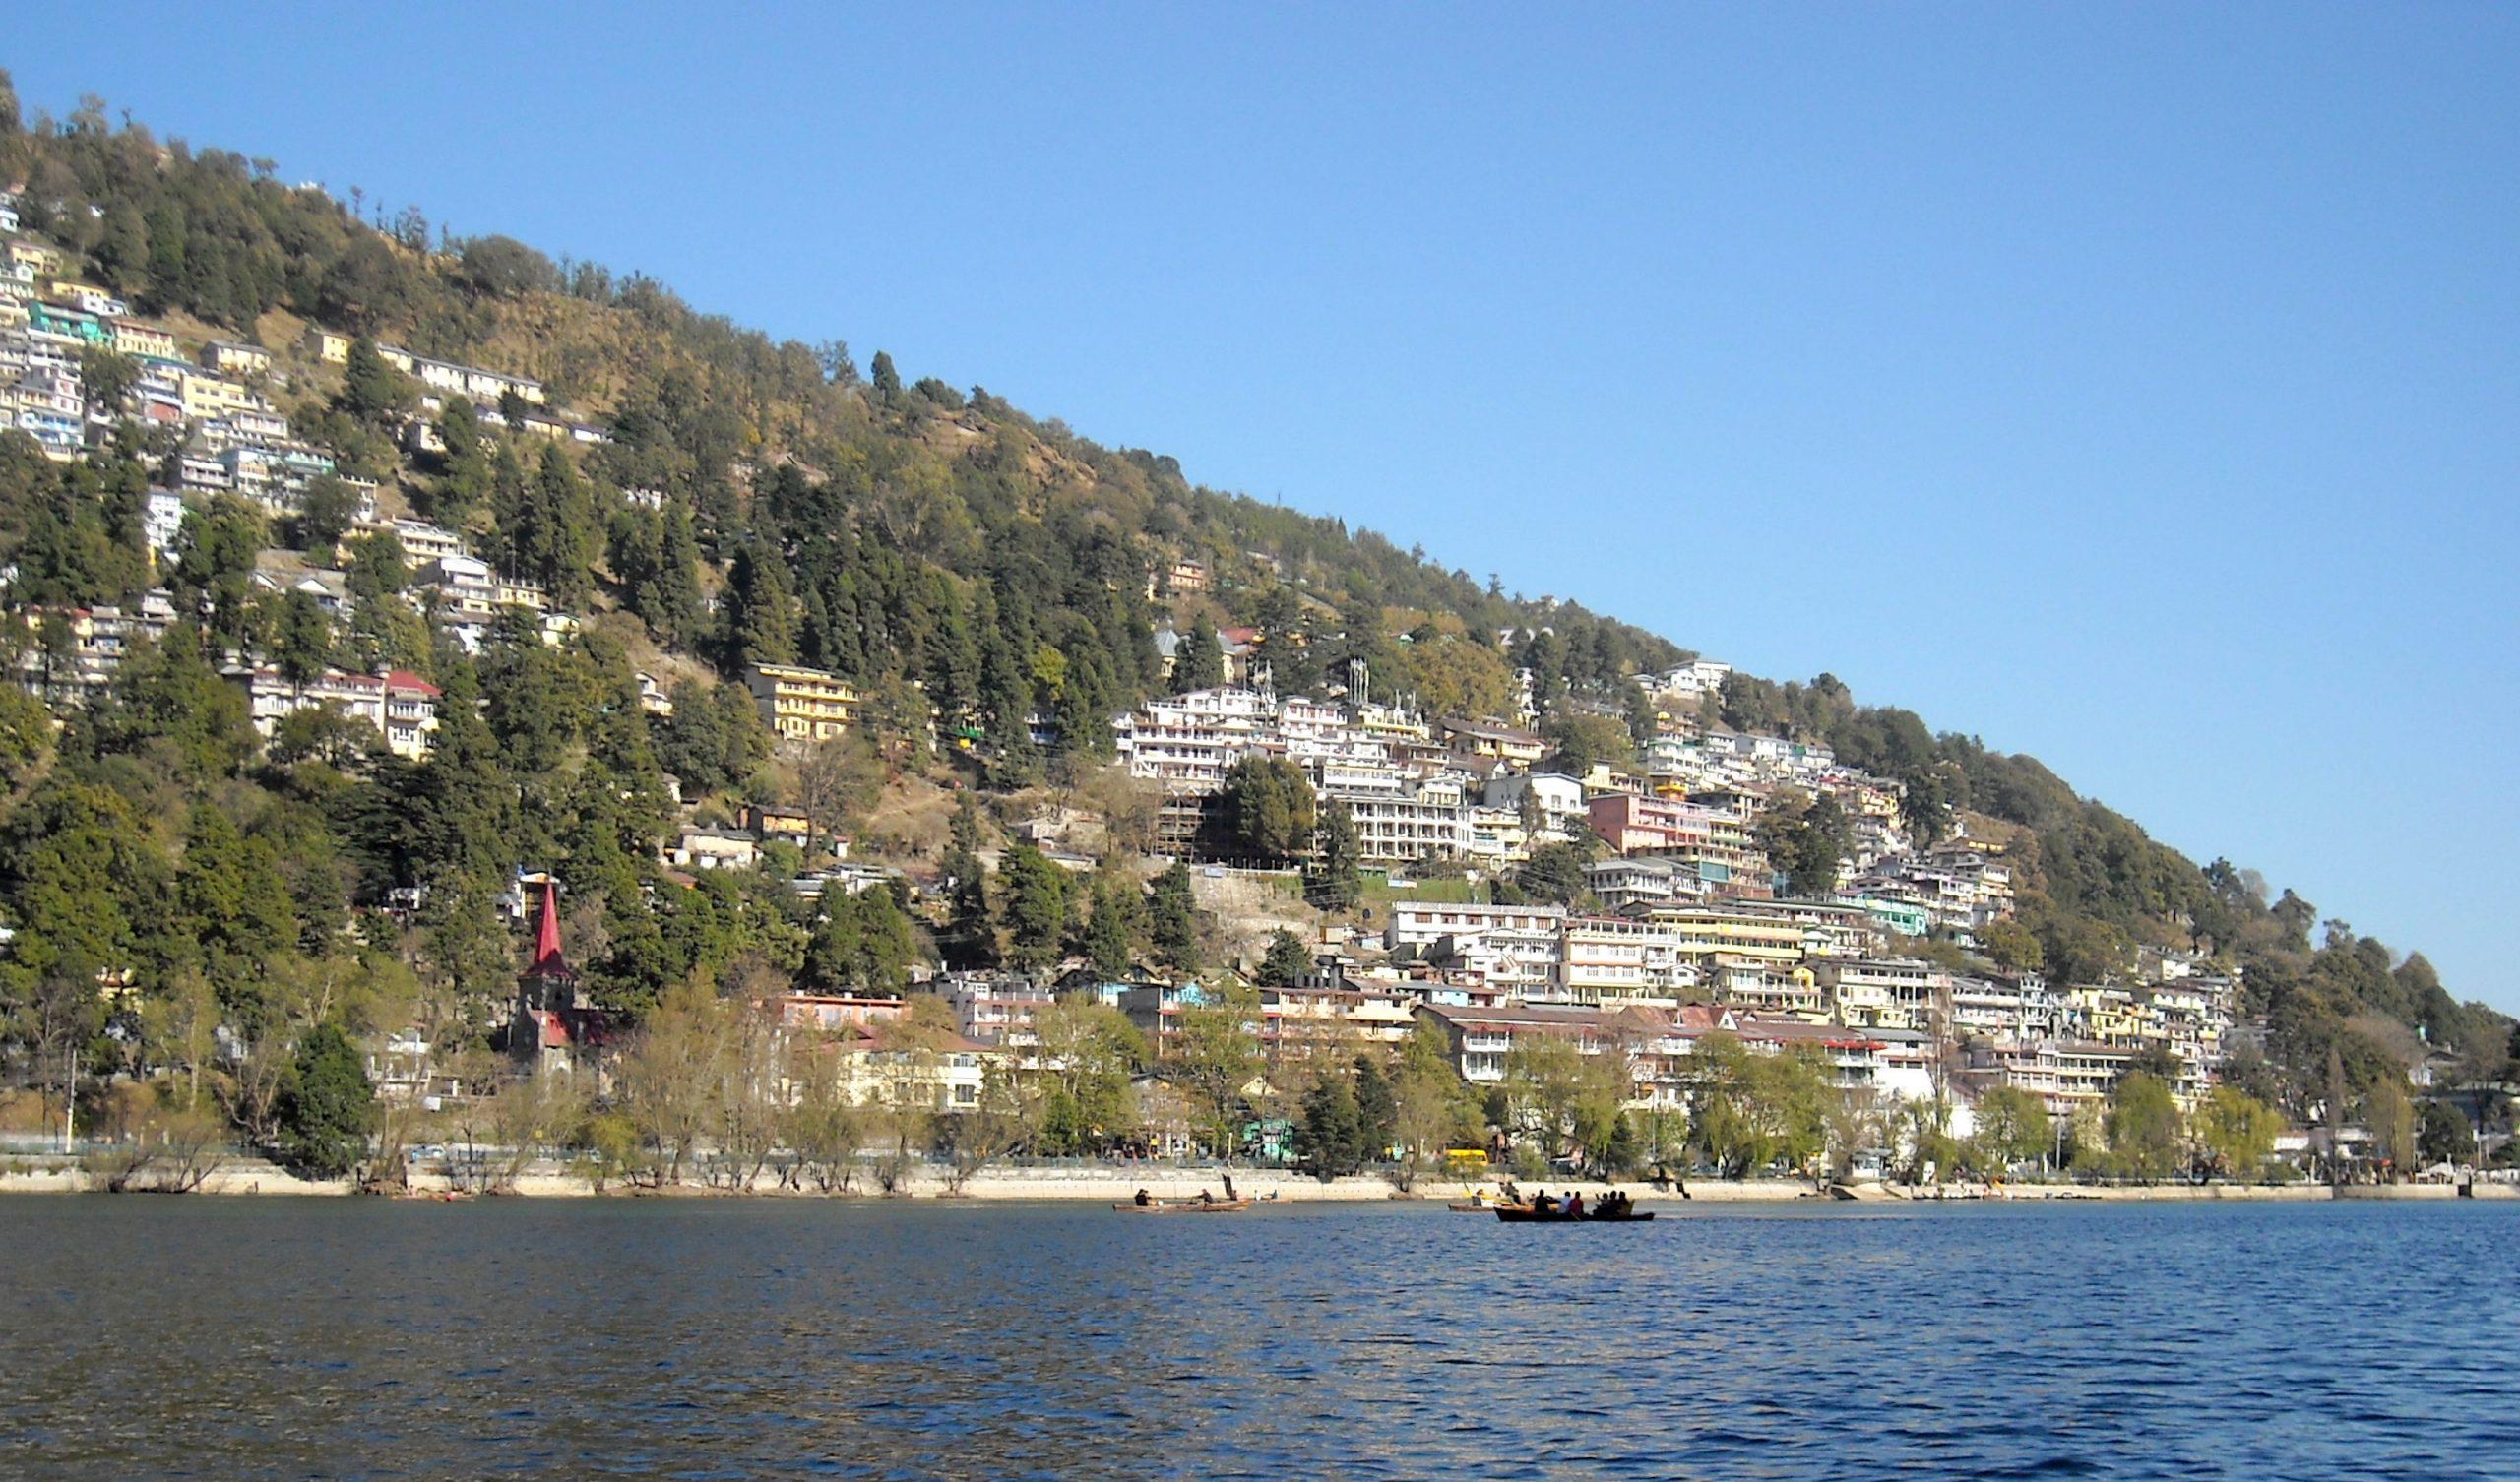 Lake near the city